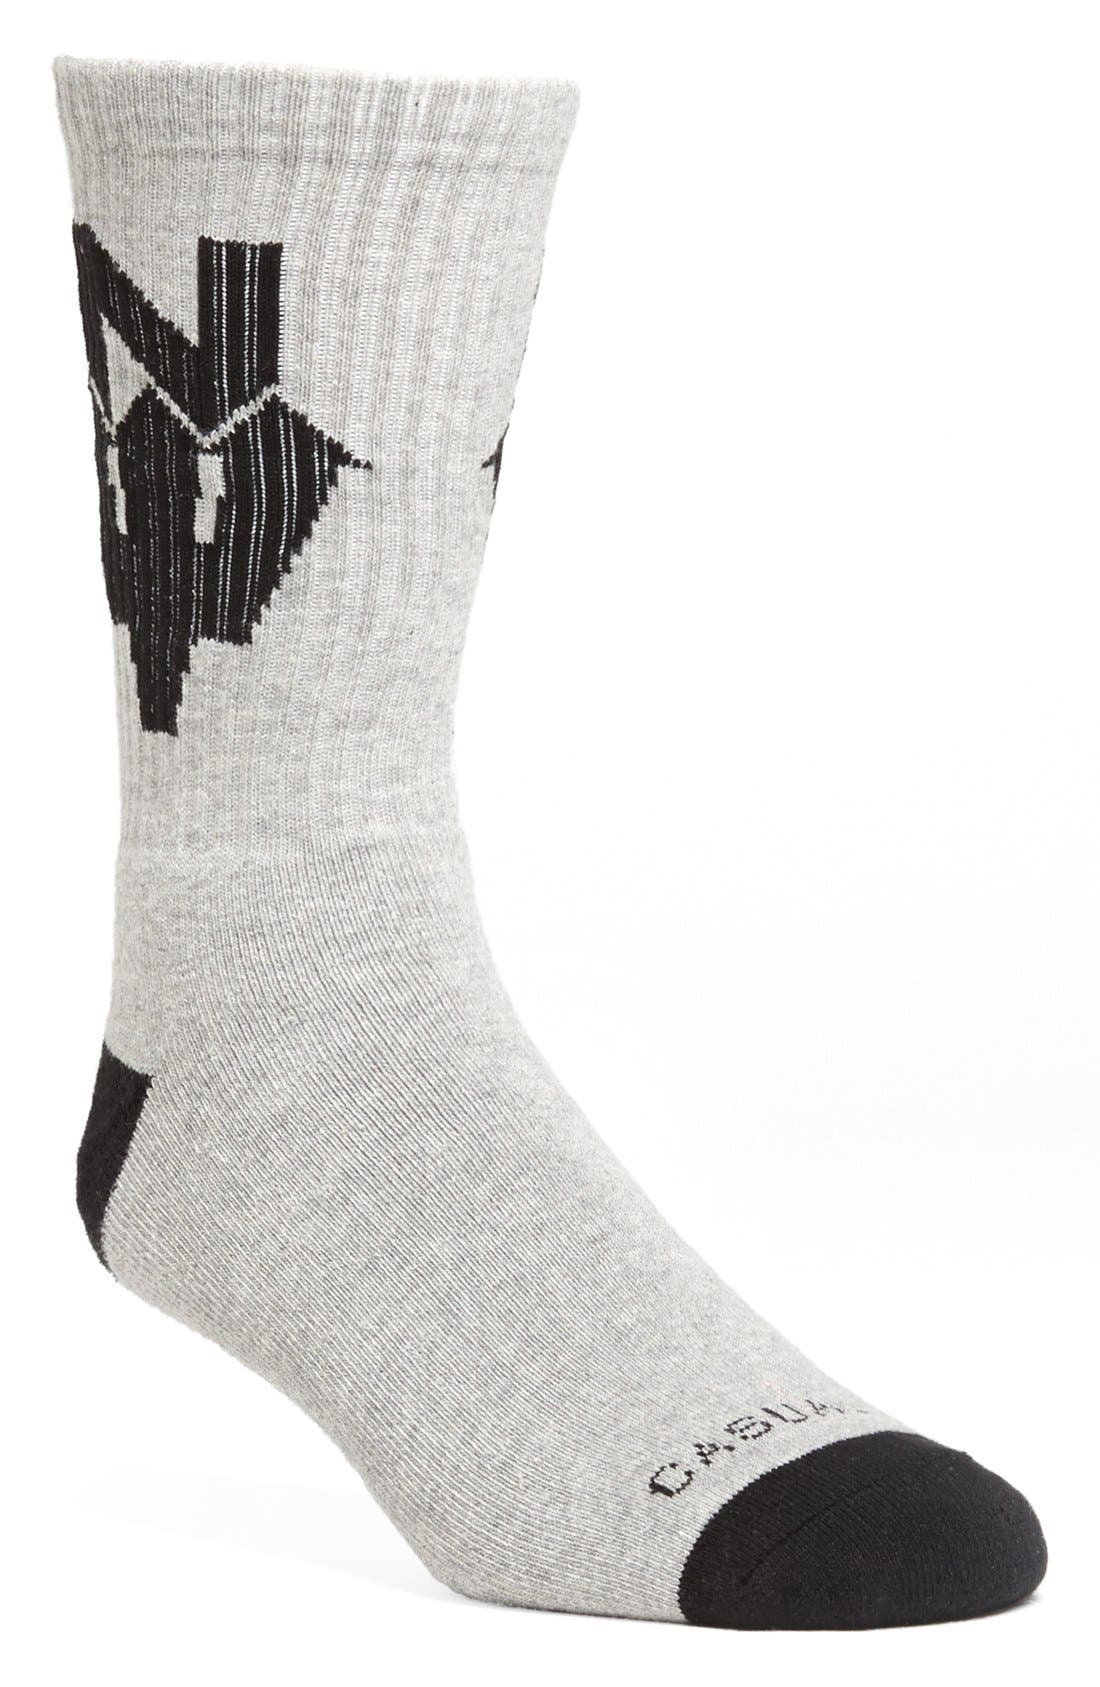 Alternate Image 1 Selected - Casual Industrees 'N Dub' Socks